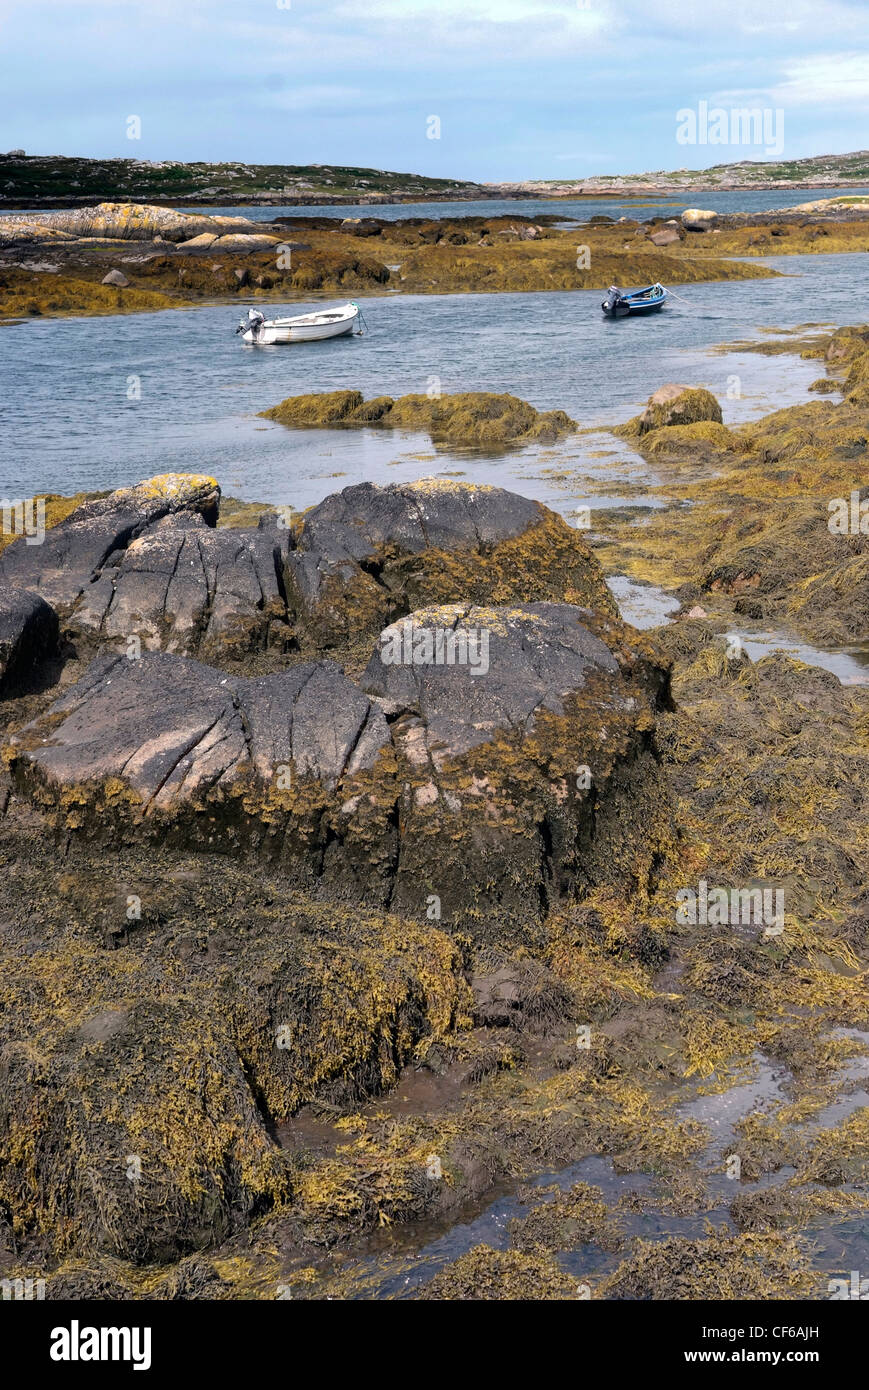 Ireland, Galway, Connemara landscape, Gaeltacht - Stock Image